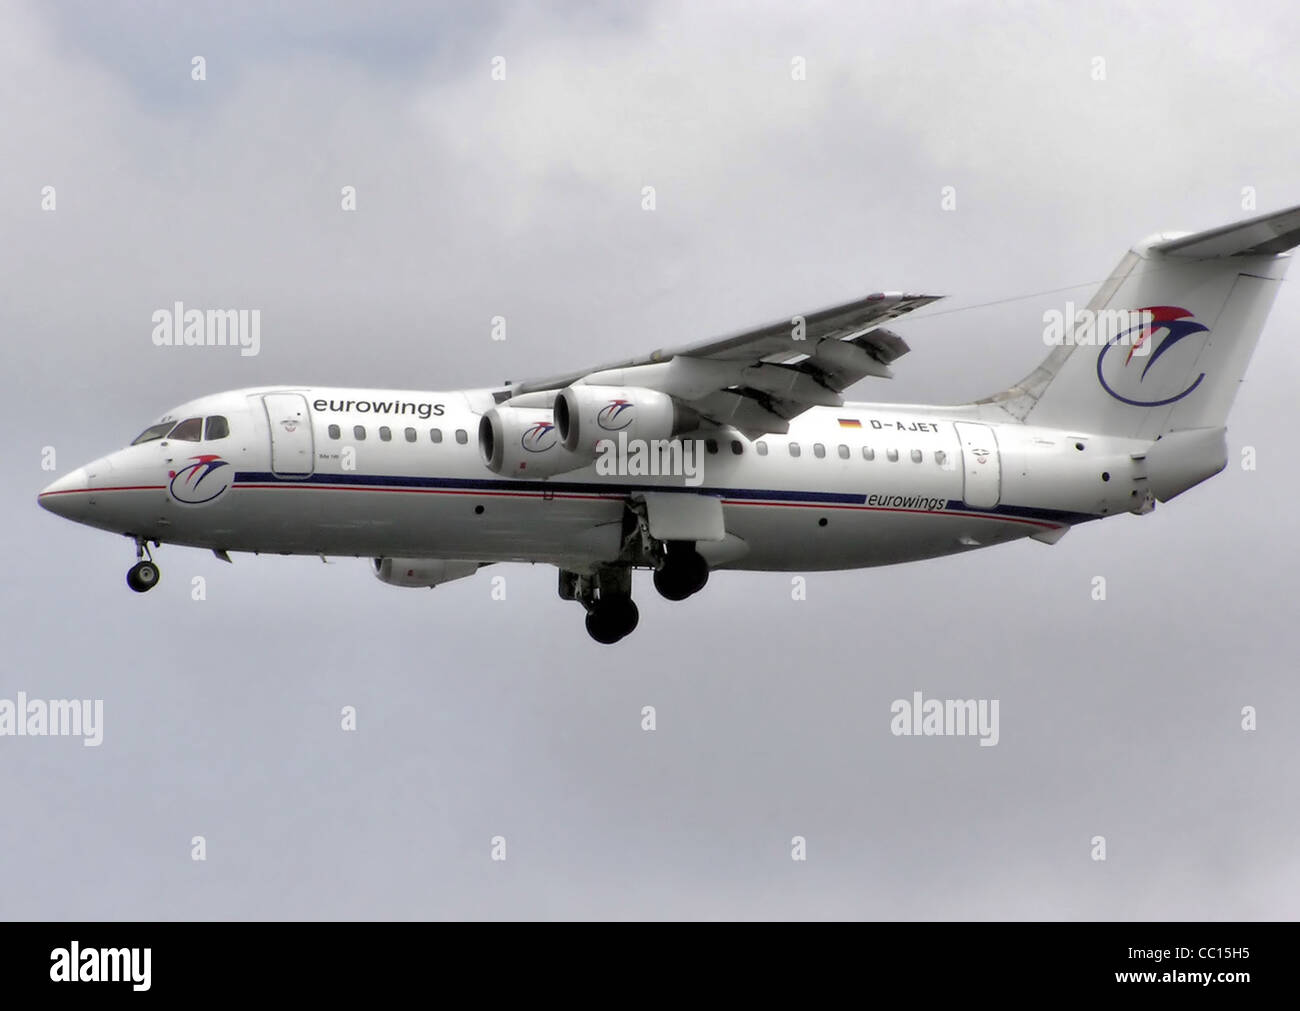 Eurowings BAe 146-200 (D-AJET) landing at London Heathrow Airport, England. - Stock Image